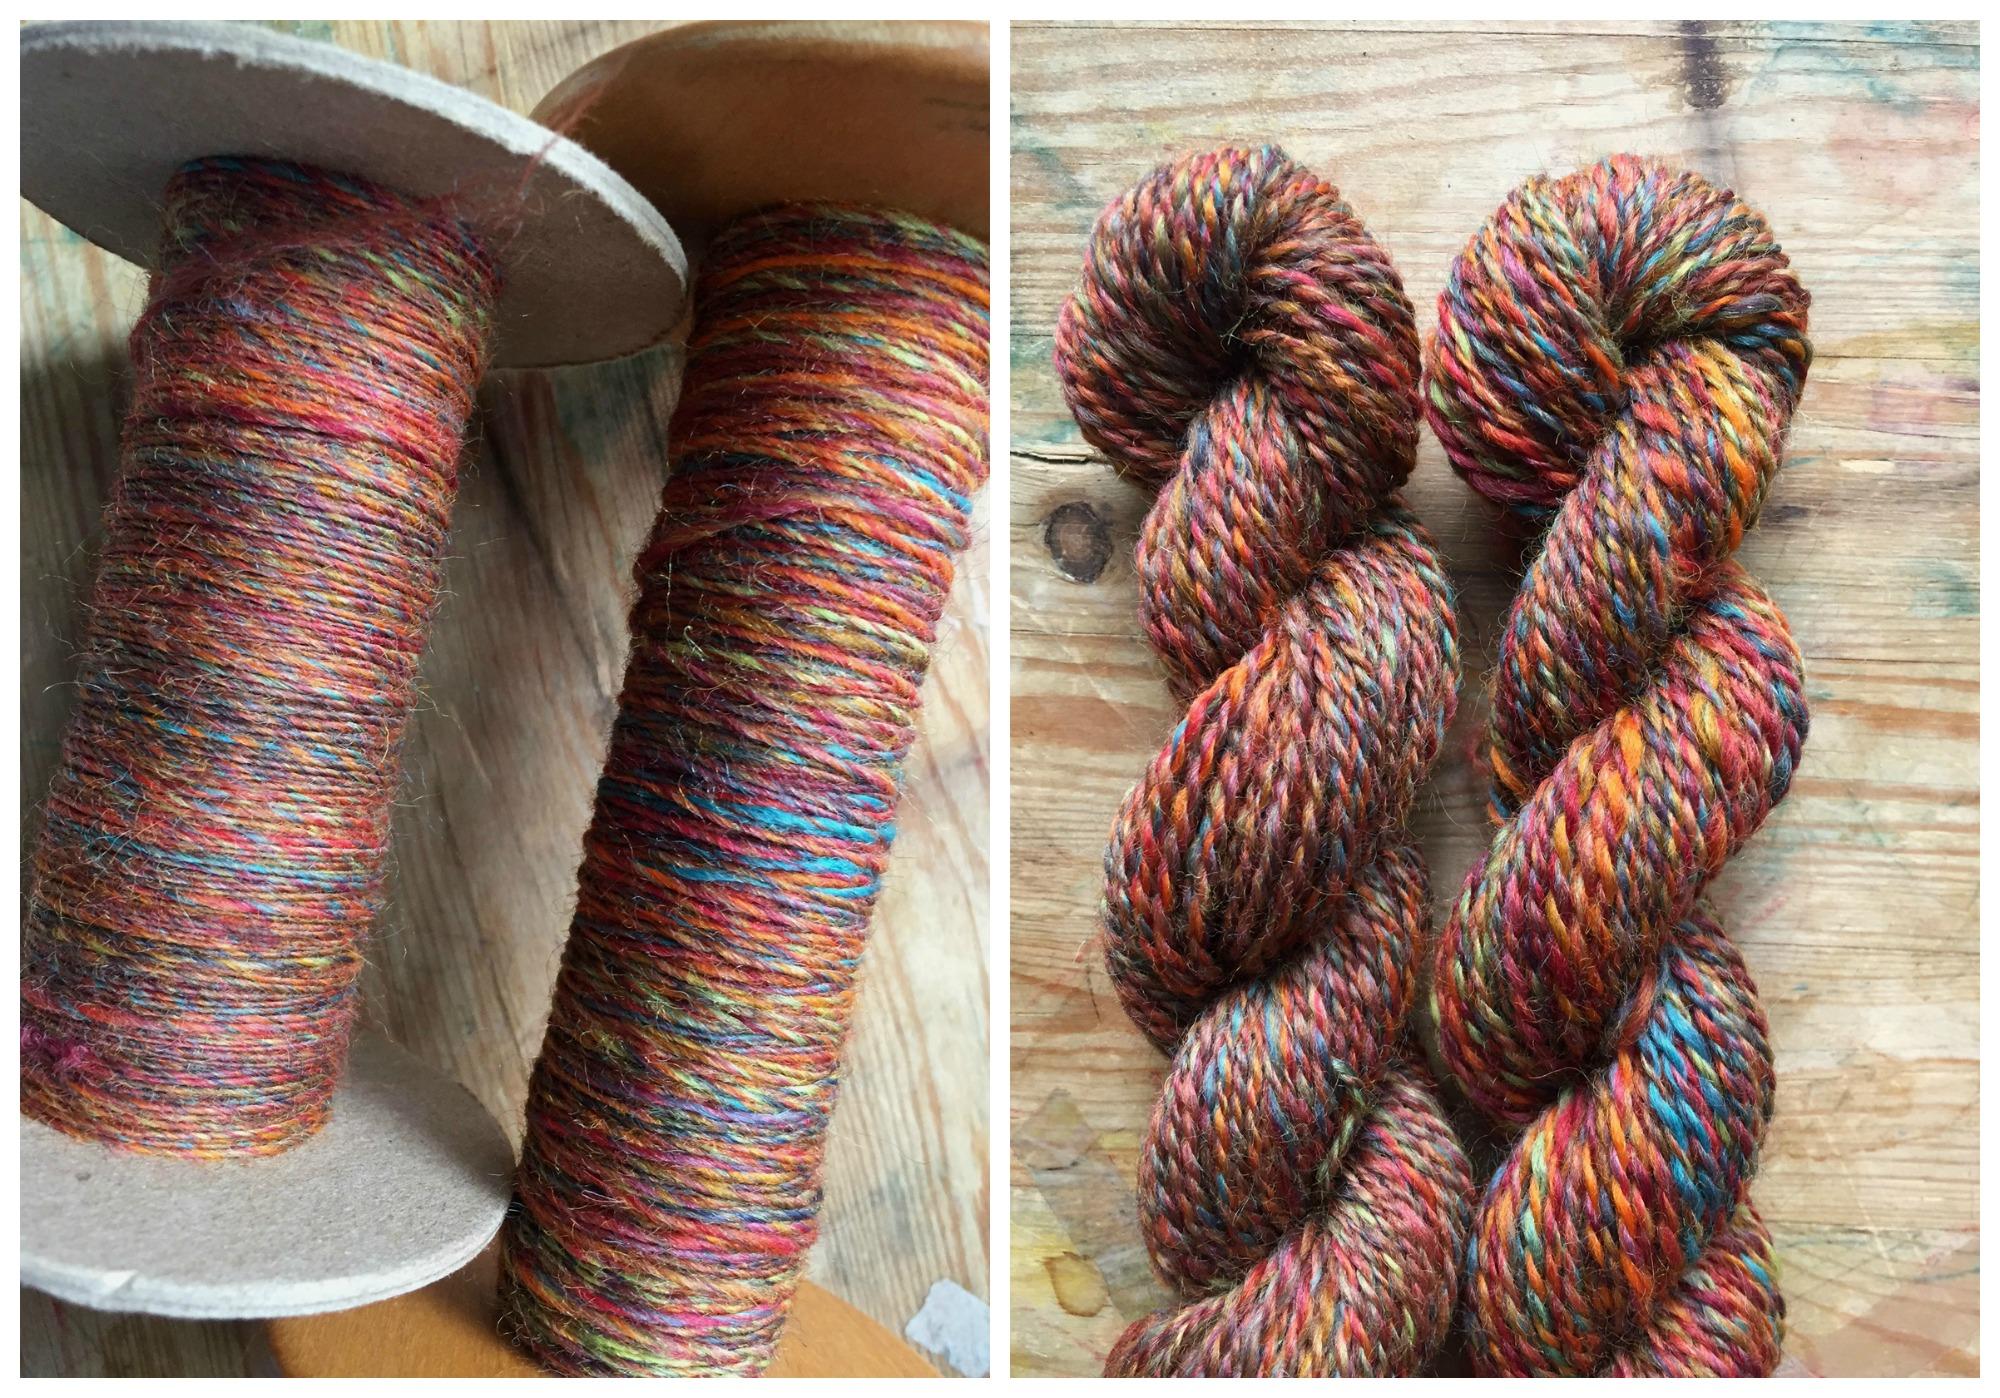 hipstrings boobbins and yarn collage.jpg